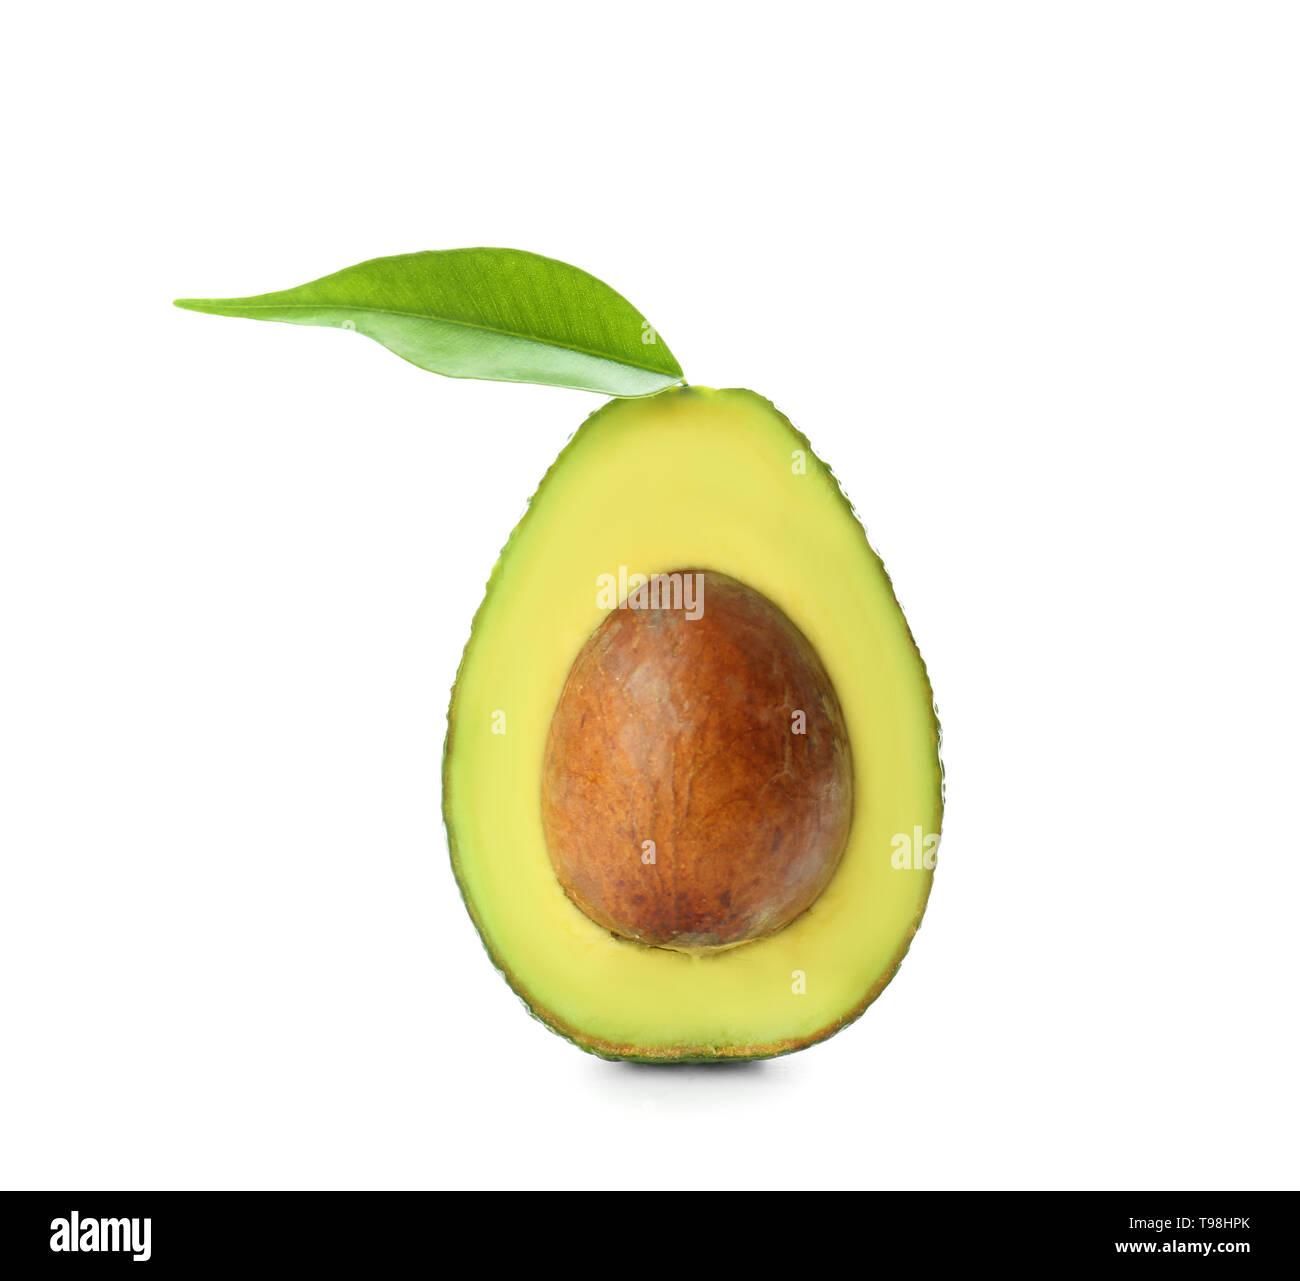 Half of ripe avocado on white background - Stock Image